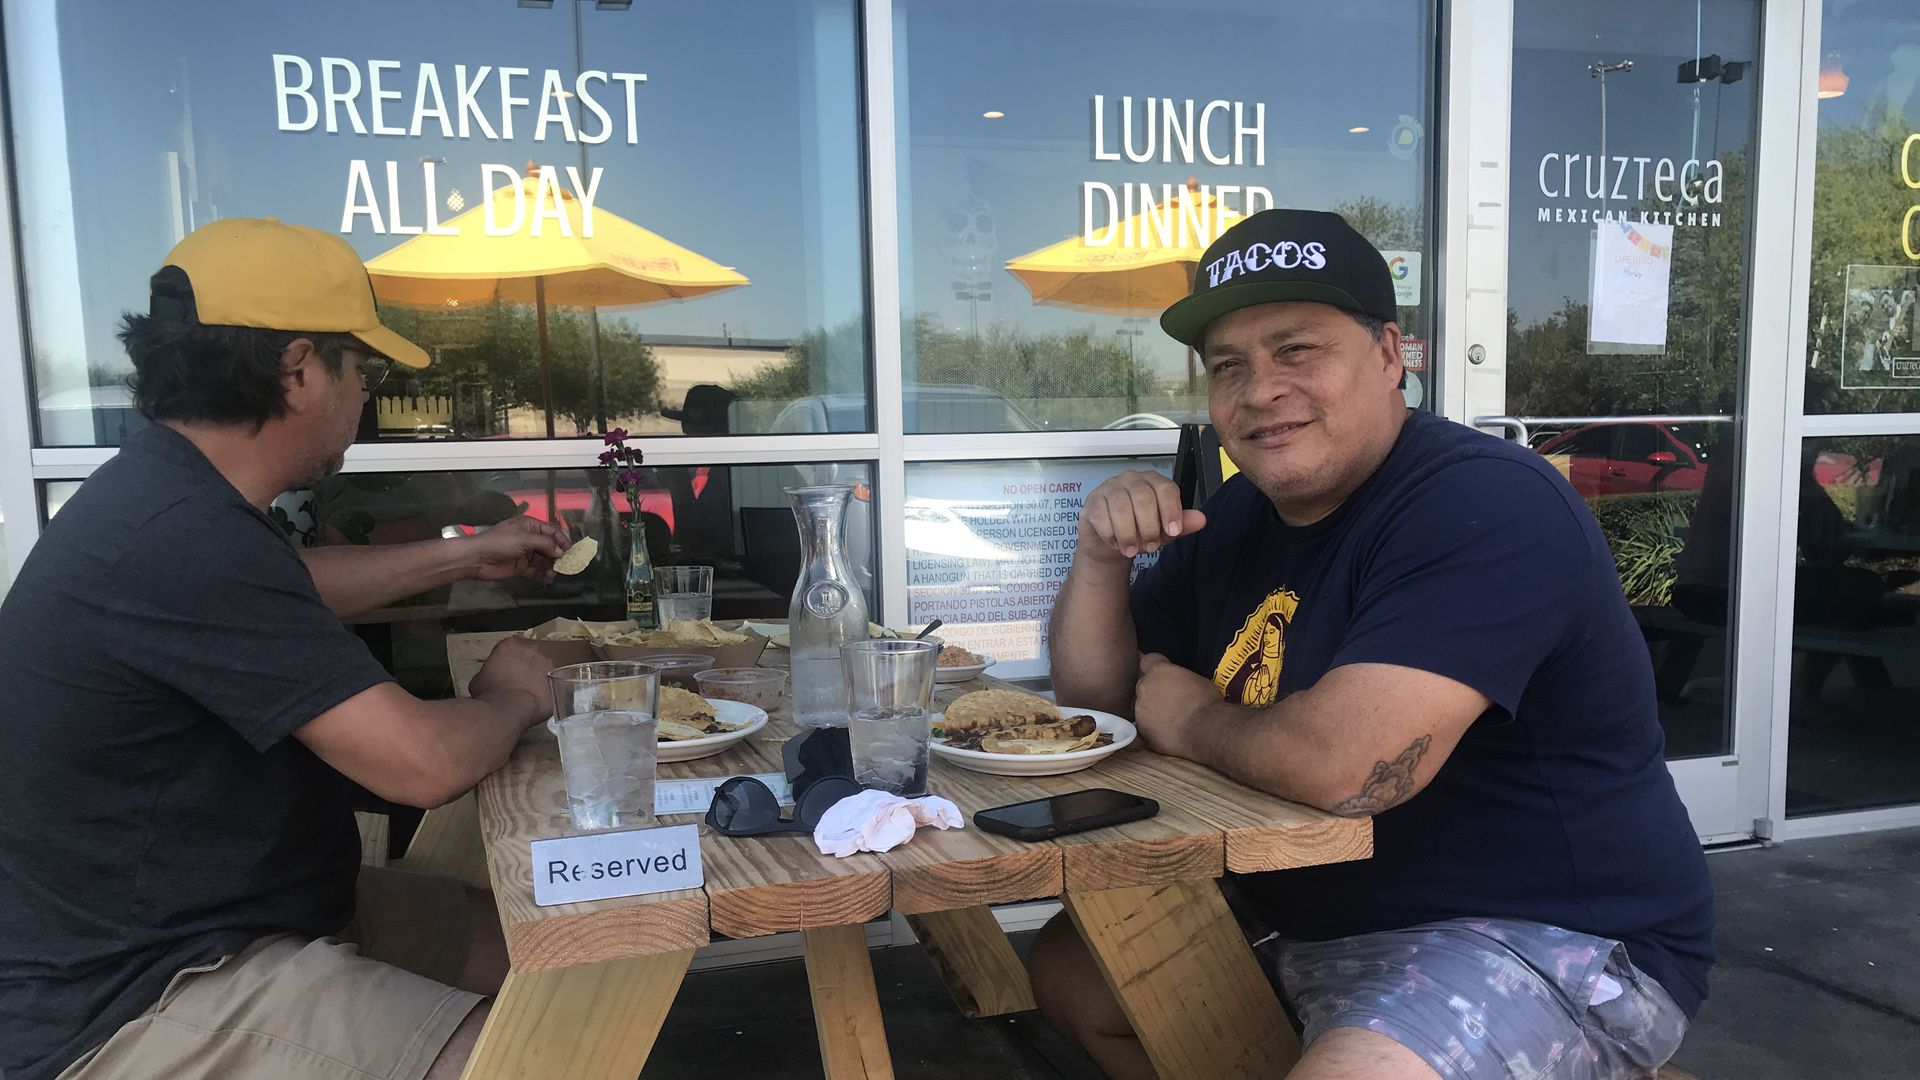 Mando Rayo, right, digs into some grub at Cruzteca